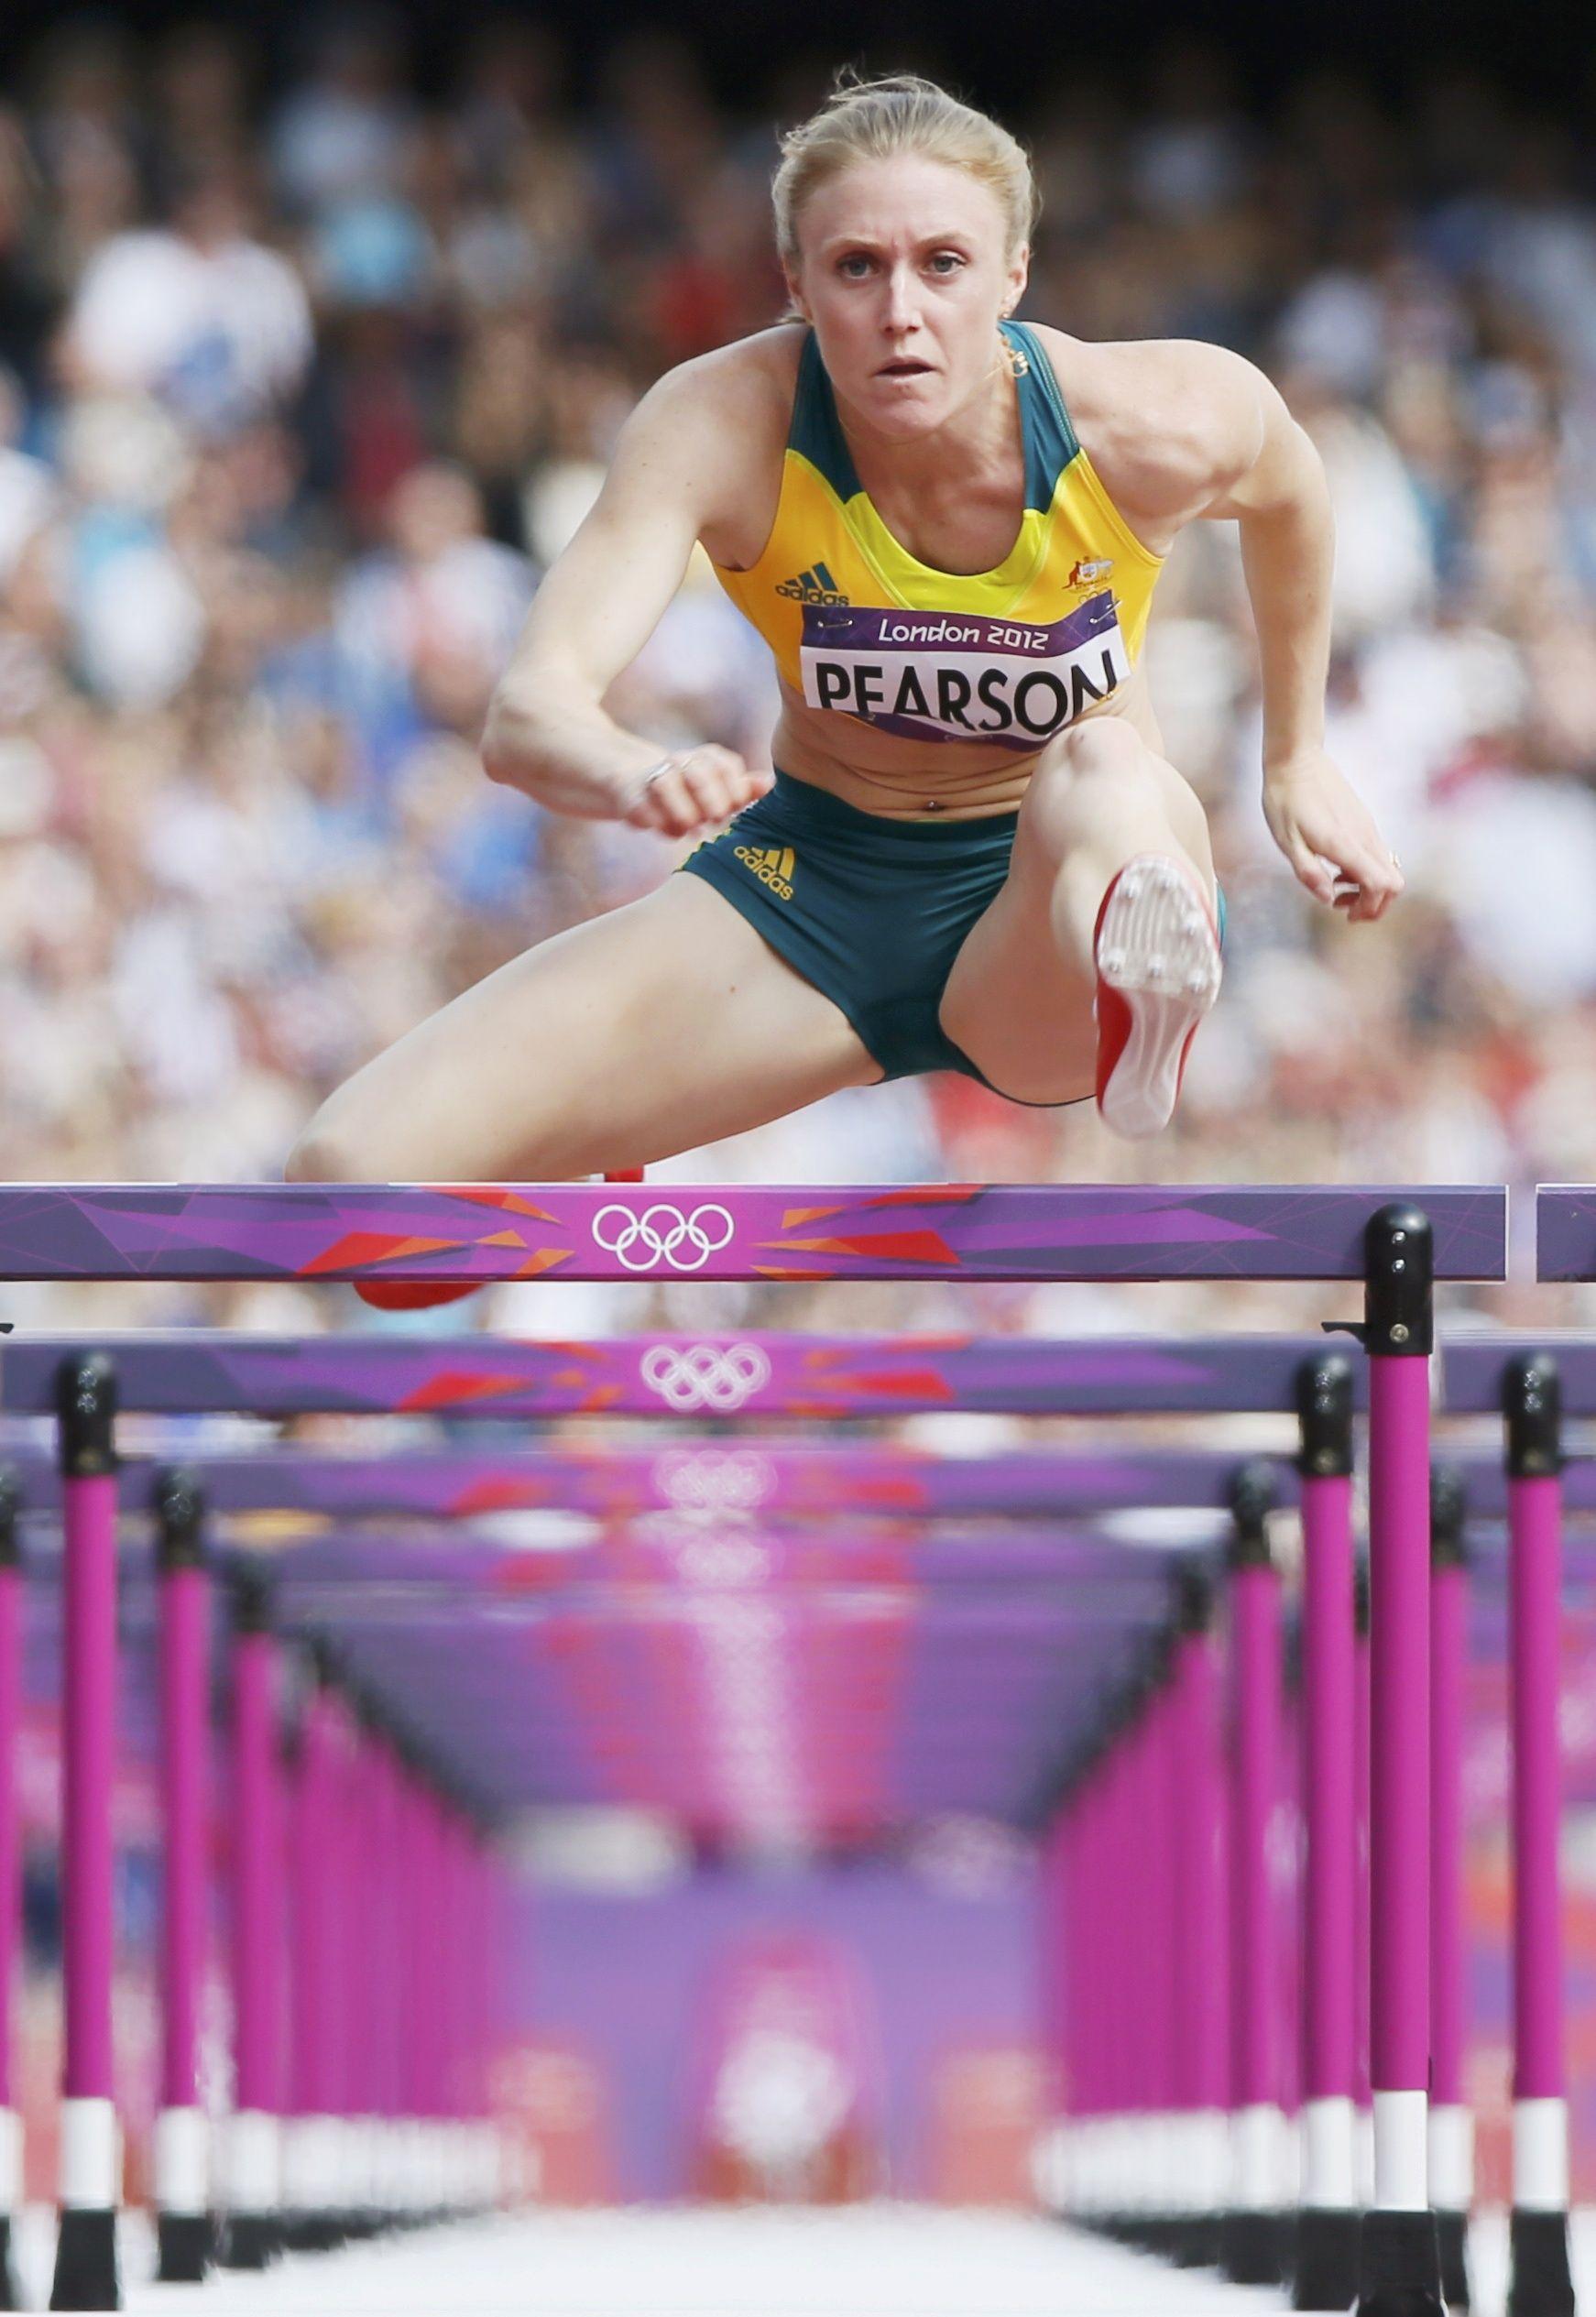 olympic hurdler pearson - 736×1068